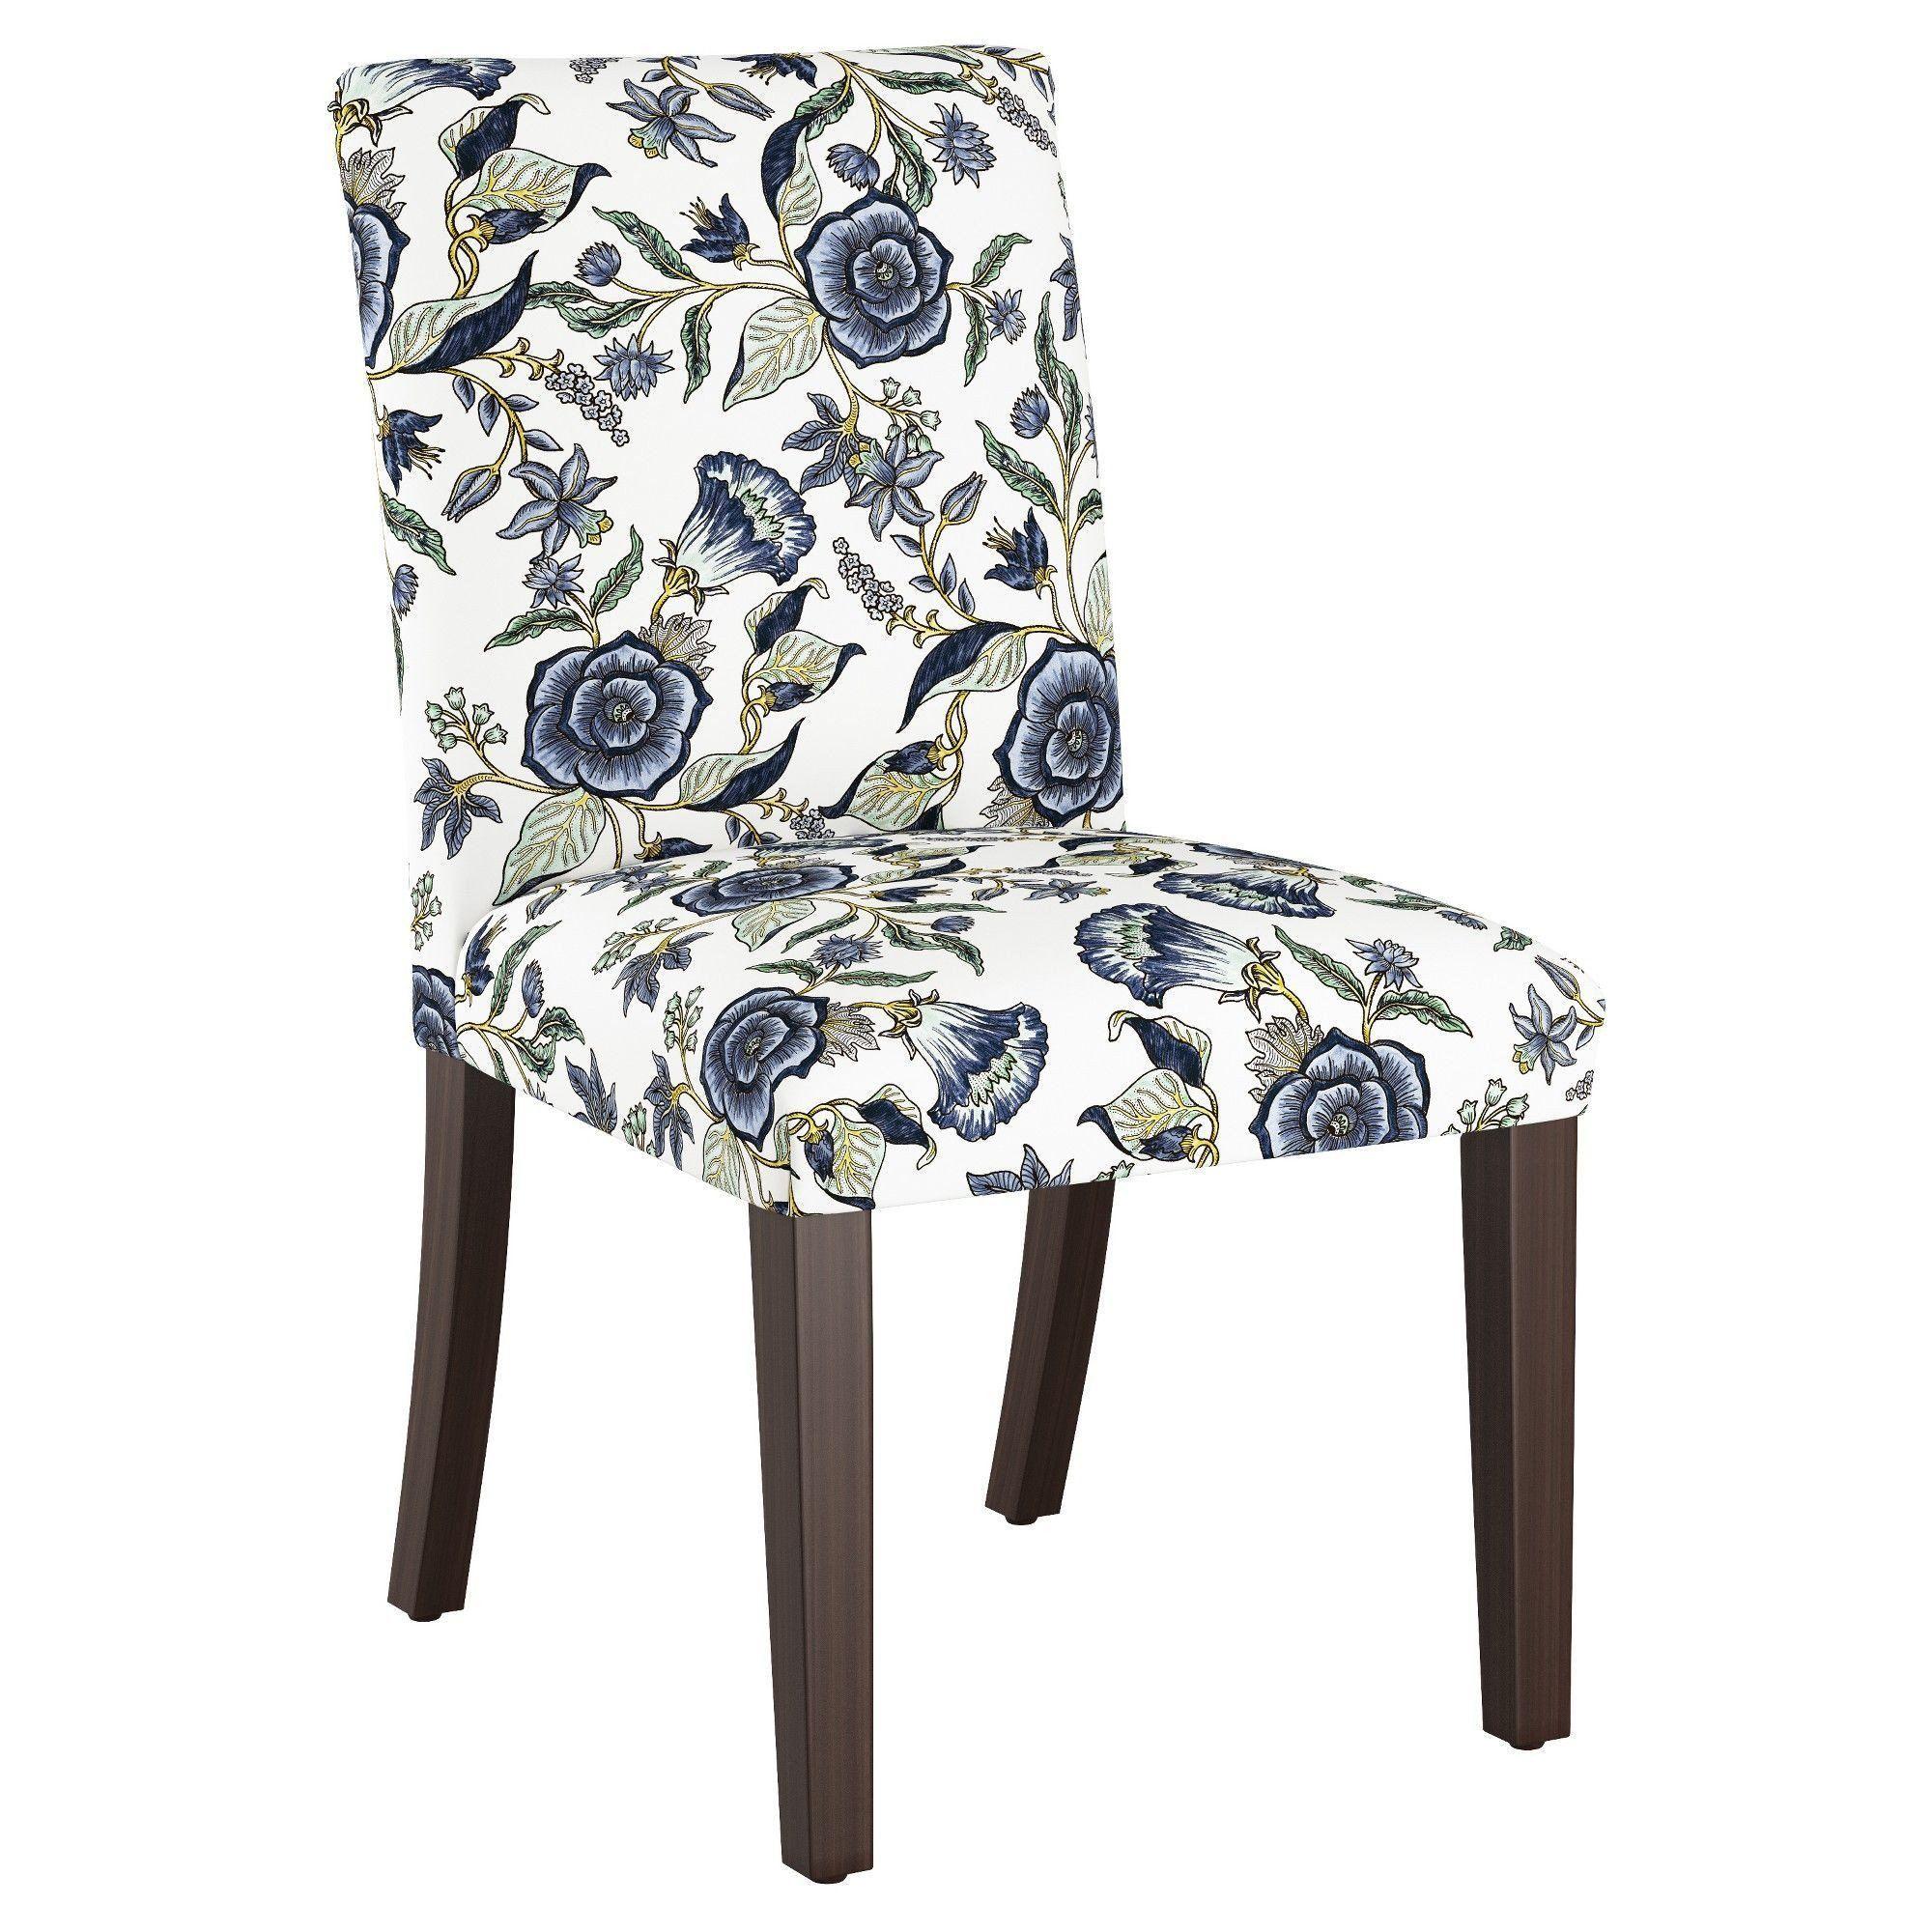 30 blue and white dining chairs dengan gambar